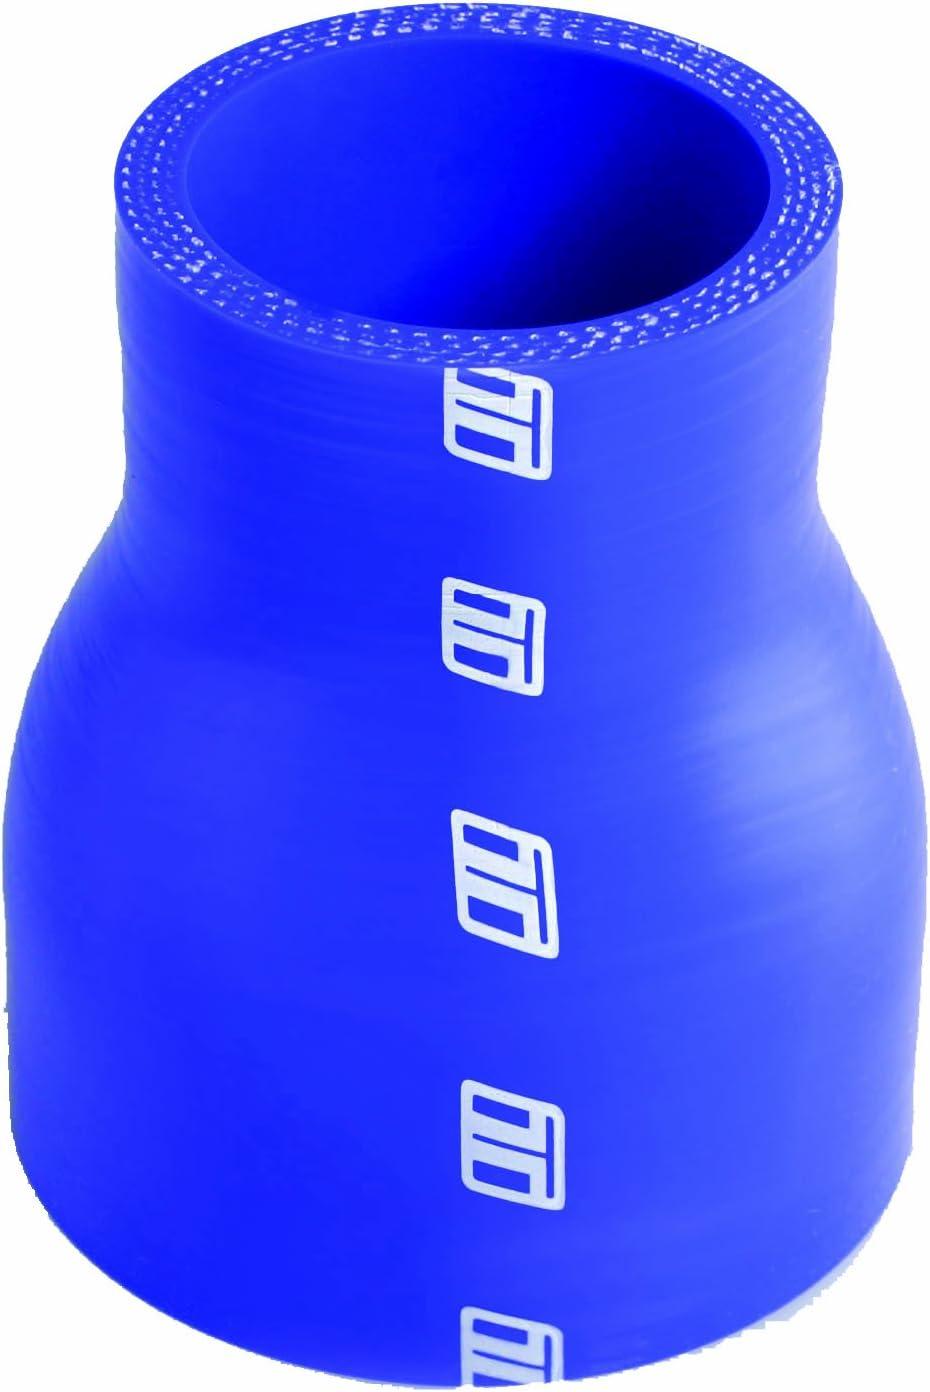 Turbosmart TS-HR225250-BE Silicone 2.25-2.50